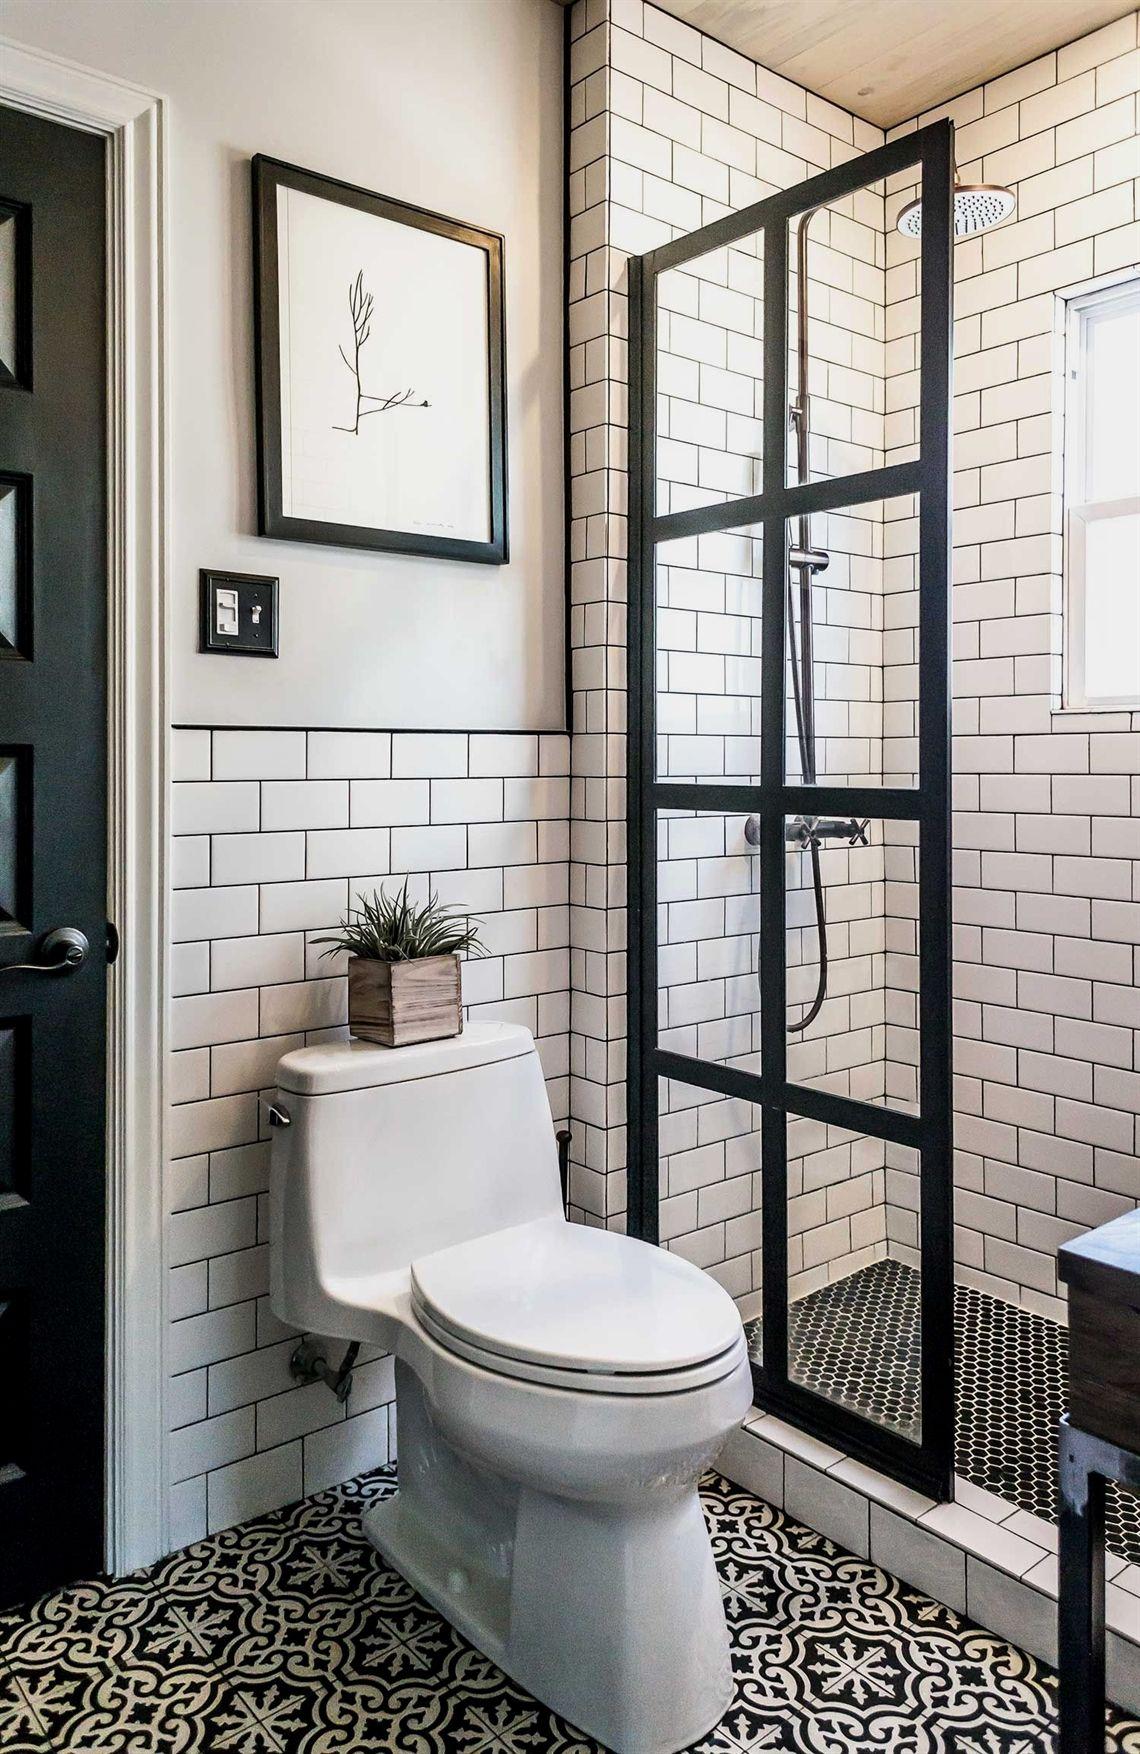 25 Beautiful Small Bathroom Ideas Bathroom Remodel Master Small Bathroom Remodel Small Master Bathroom